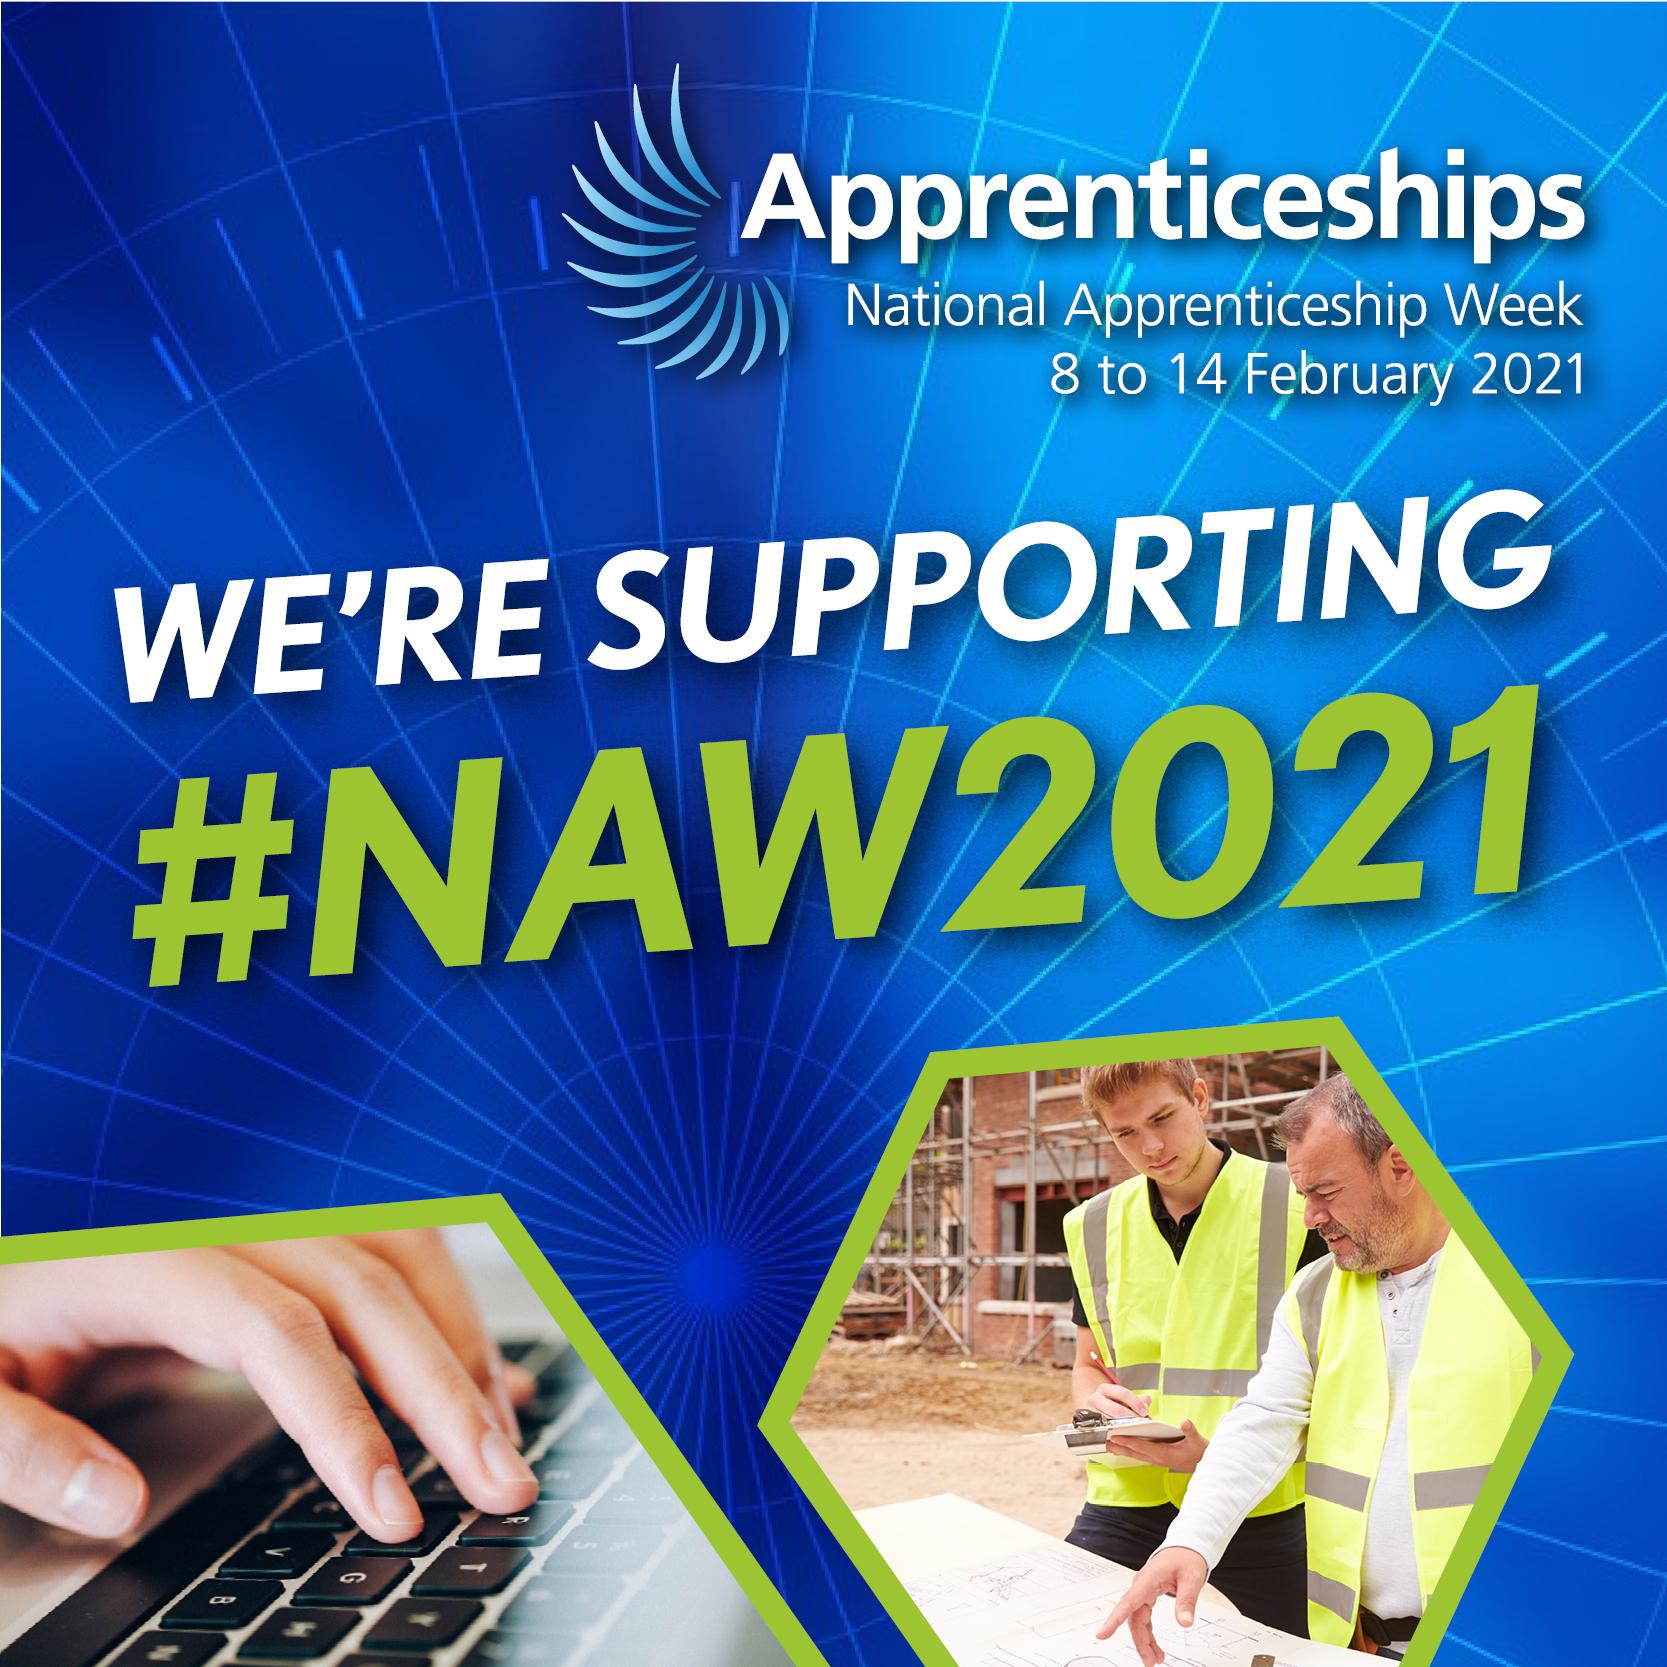 National Apprenticeship Week Day 5